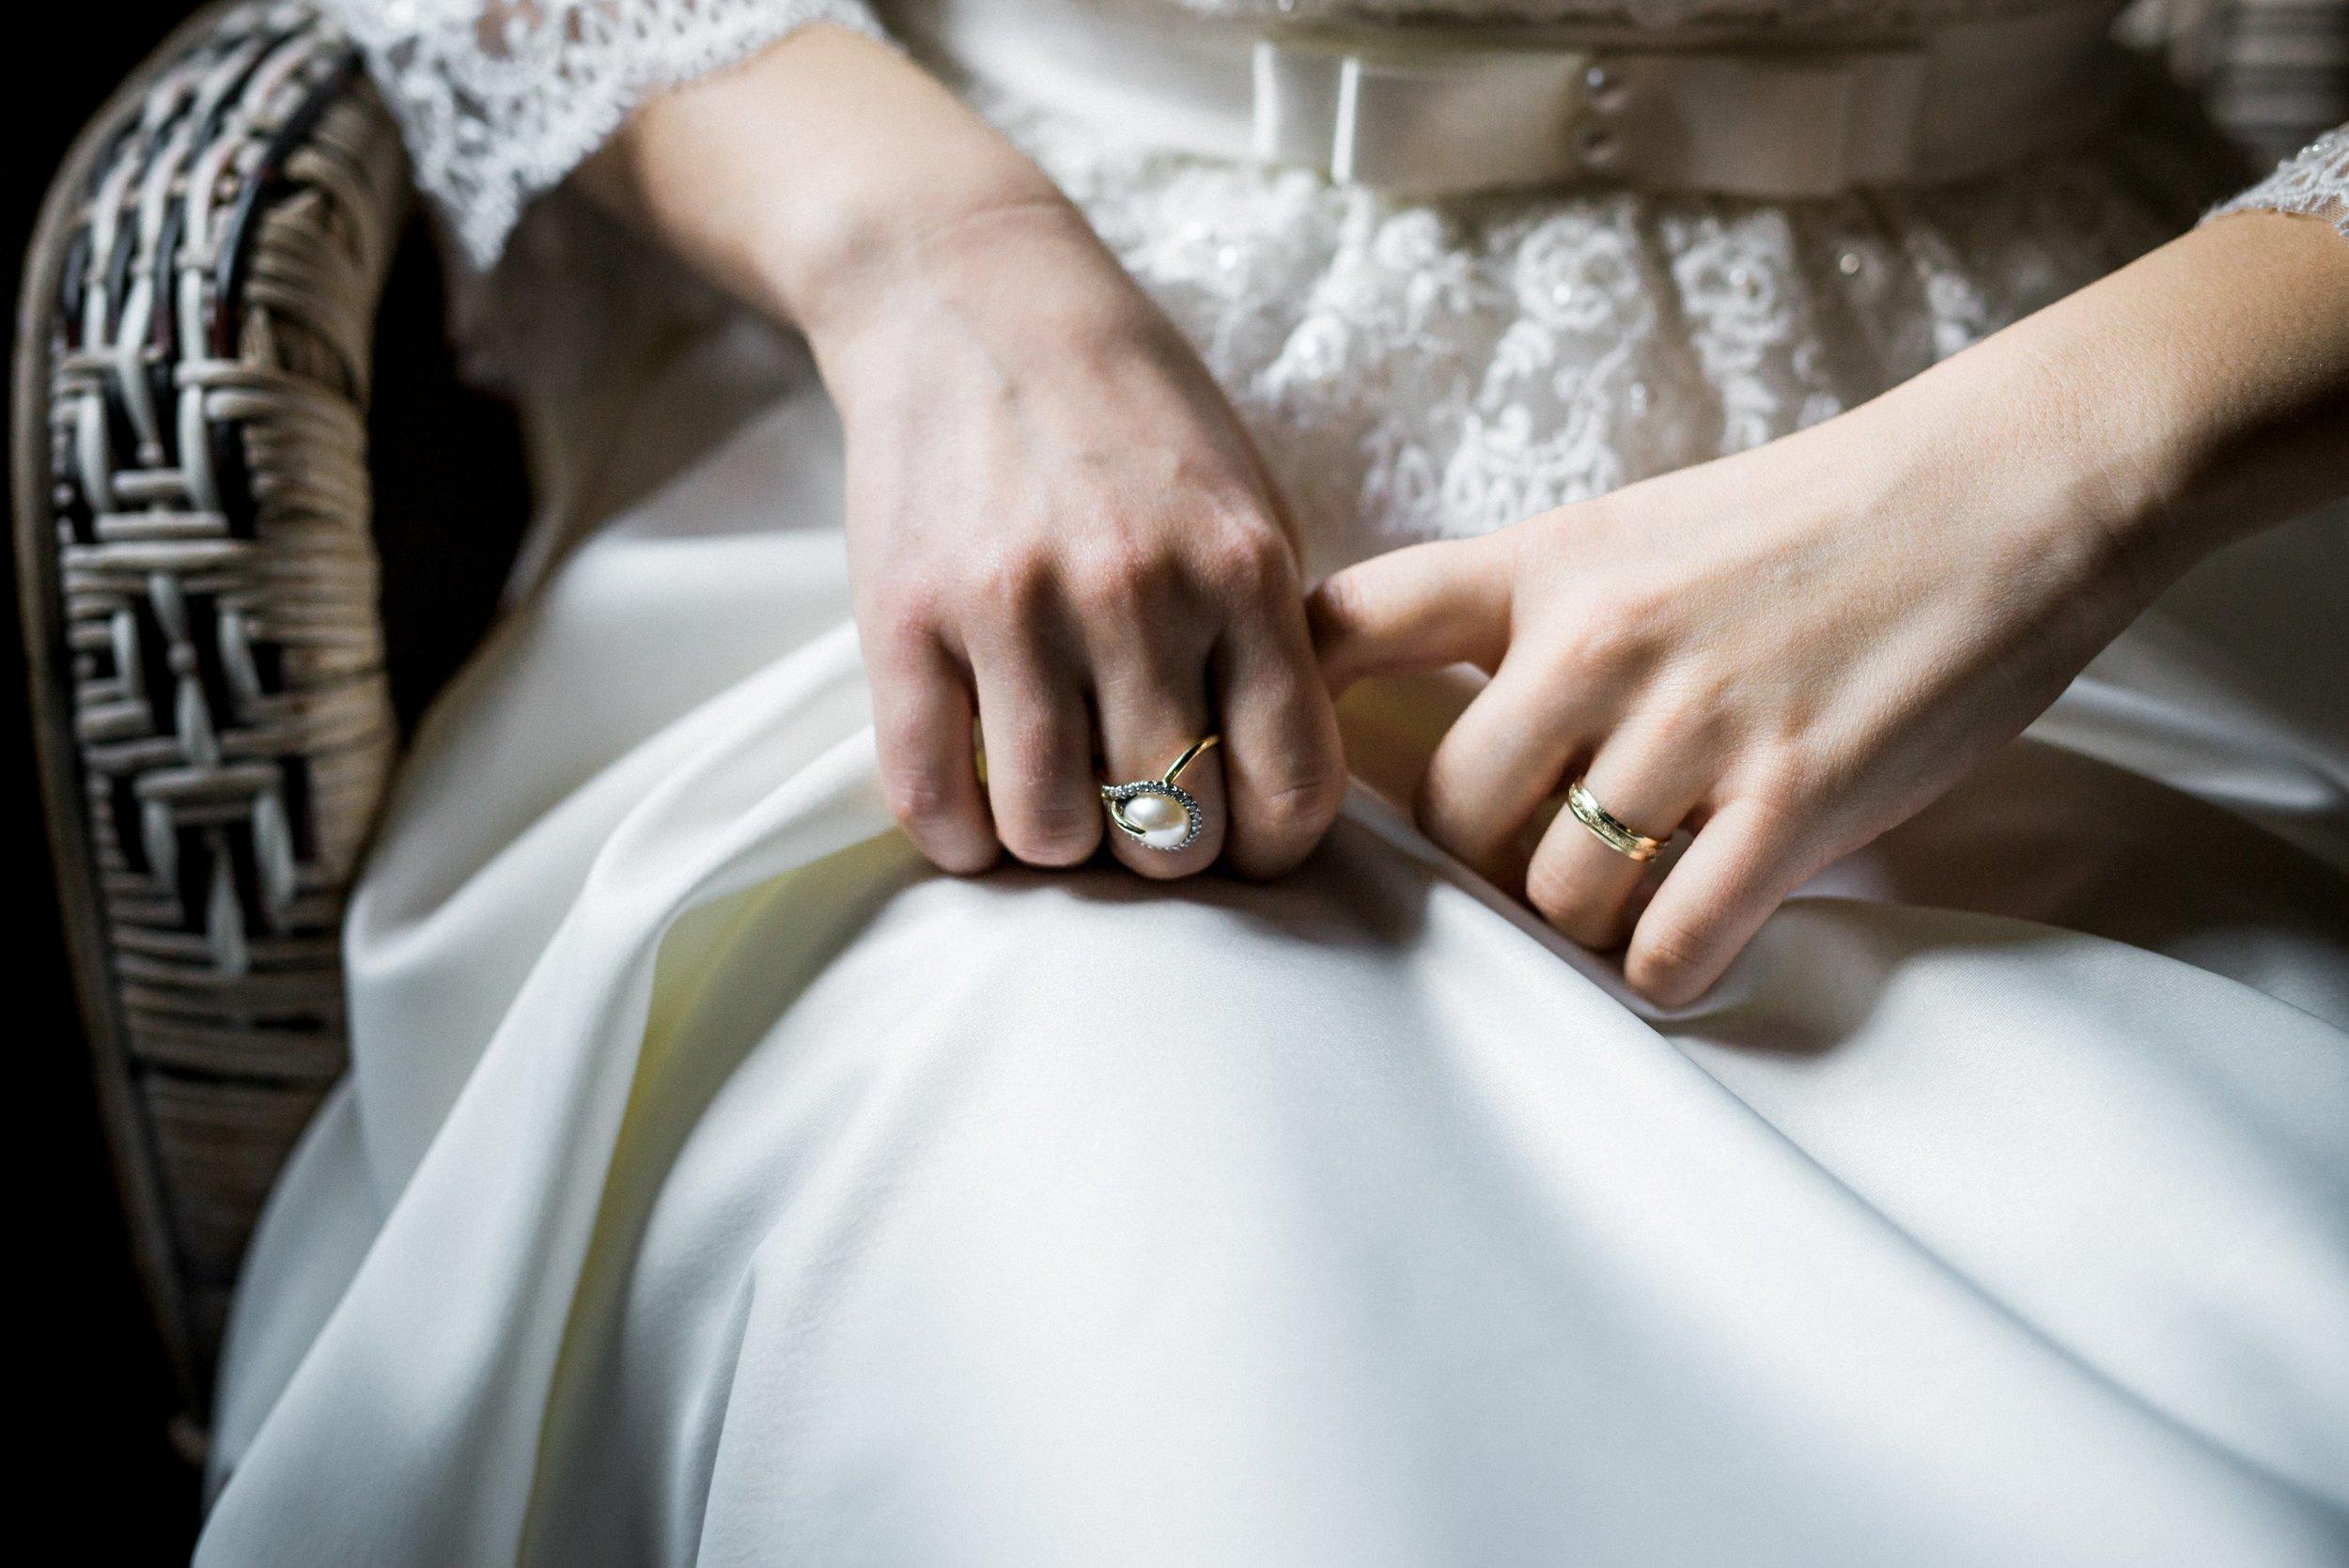 israel-garden-wedding-portraits-session-kate-giryes-photography--46_WEB.jpg